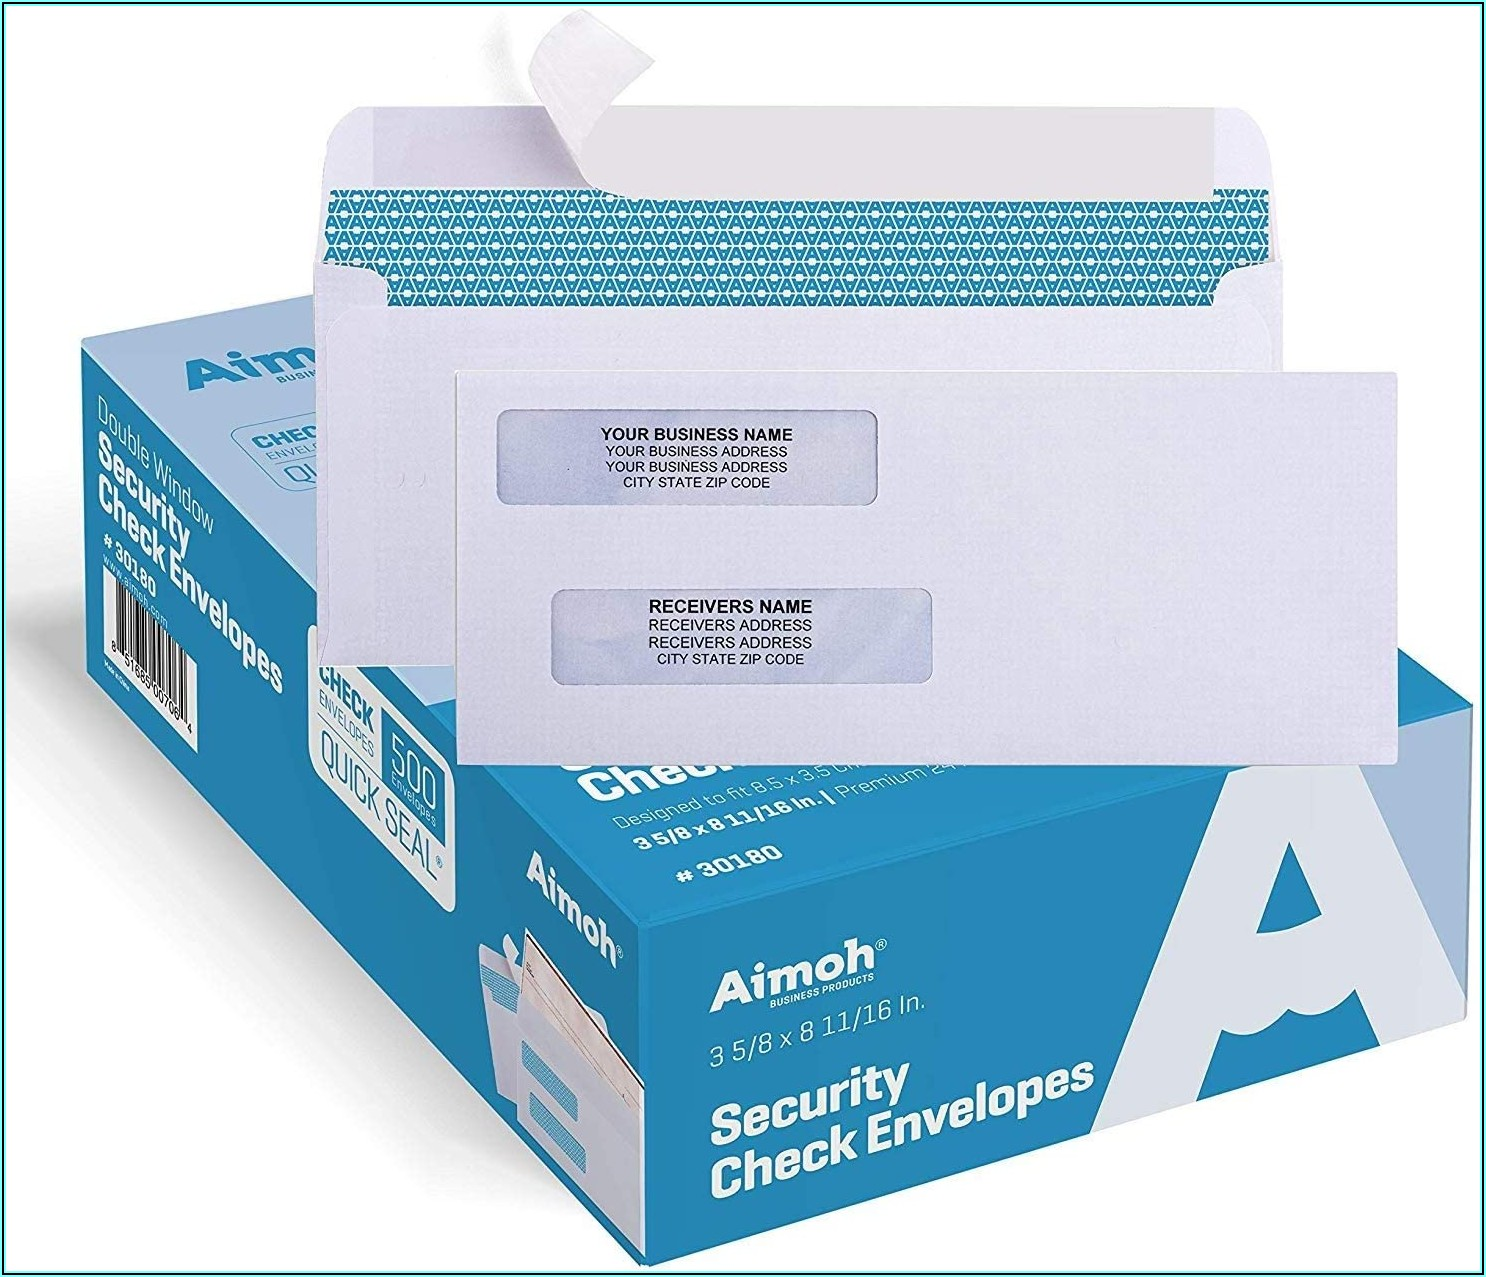 What Size Double Window Envelopes For Quickbooks Checks